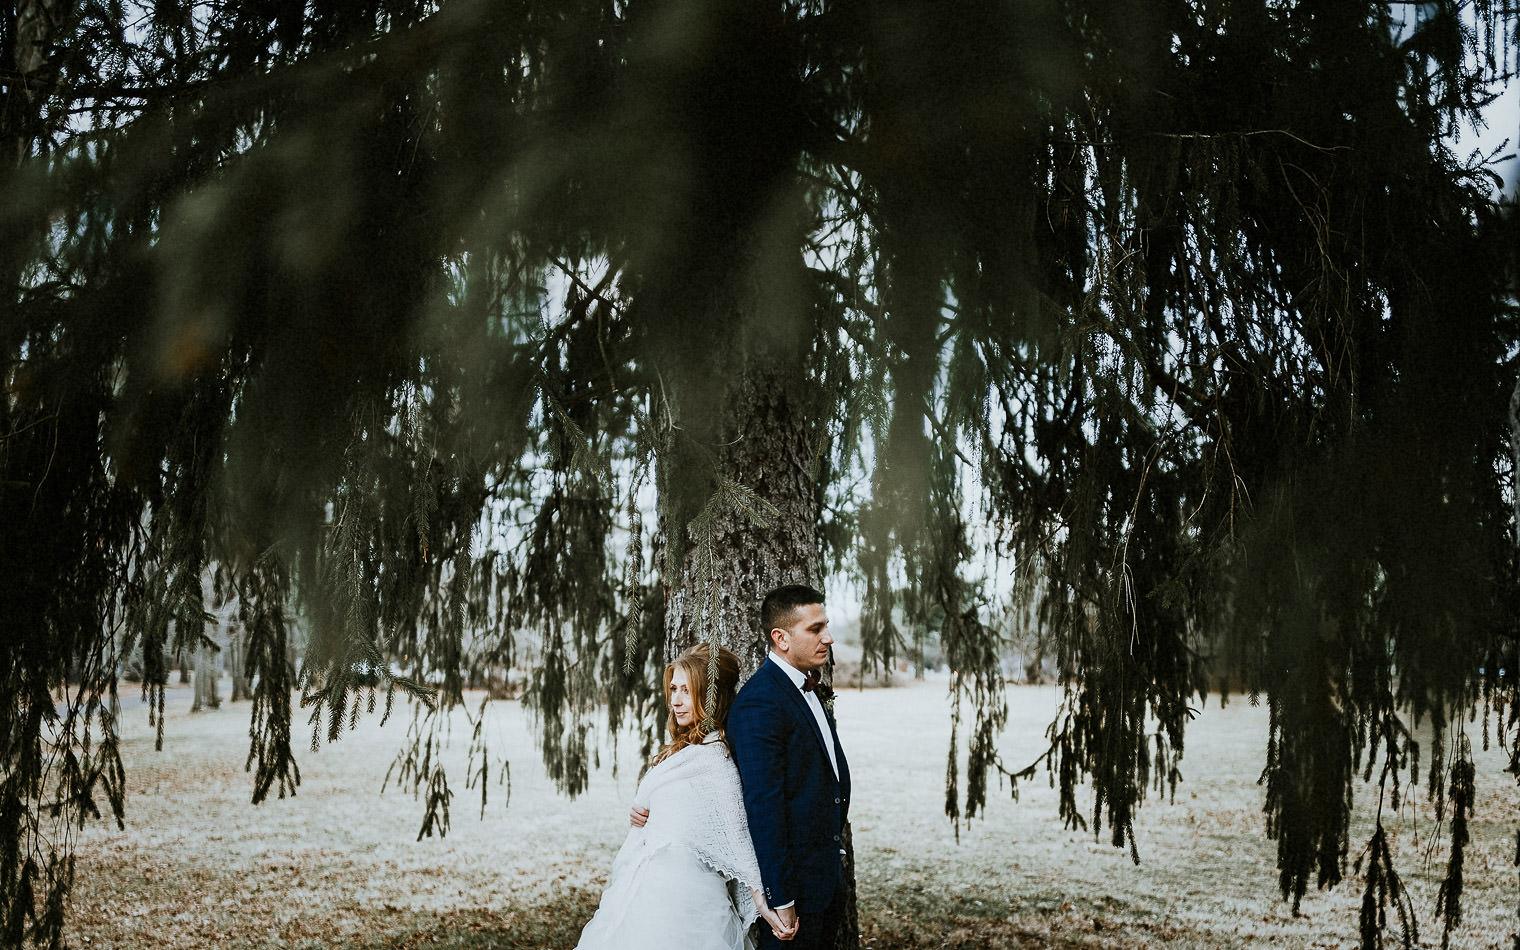 Jay-Cassario-Leica-Wedding-32.jpg